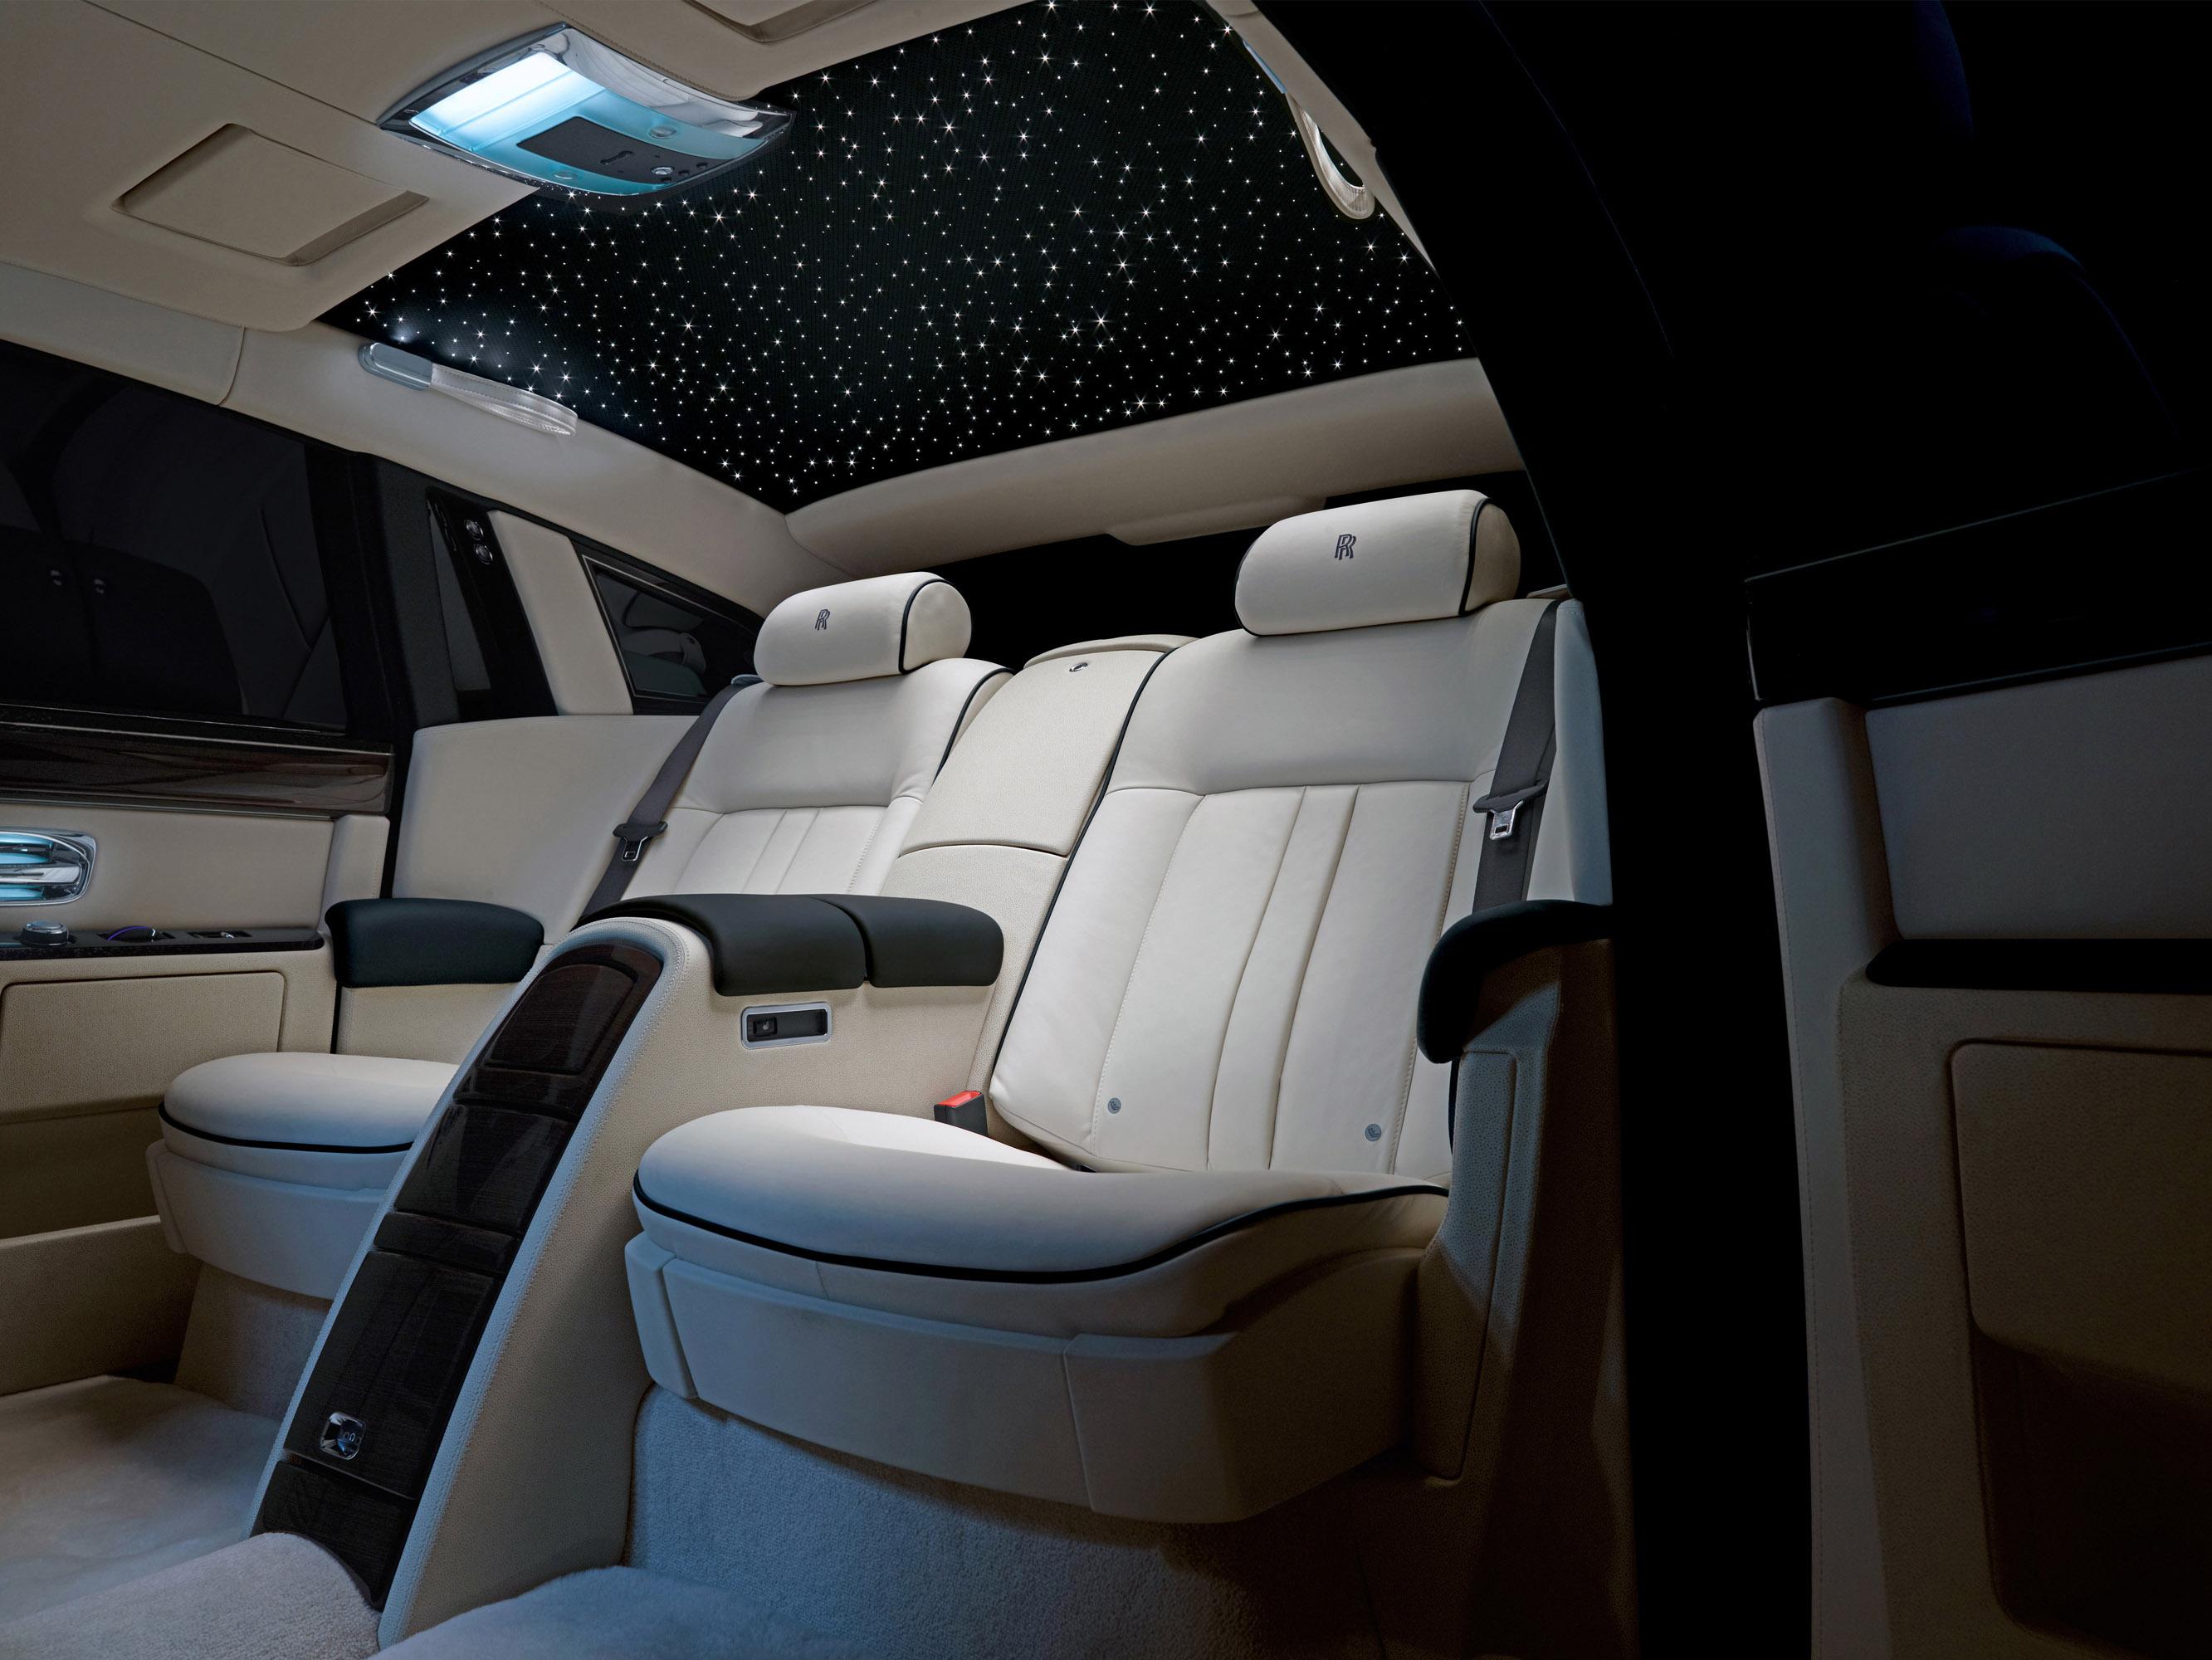 2012 Rolls Royce Phantom Extended Wheelbase With A Beijing